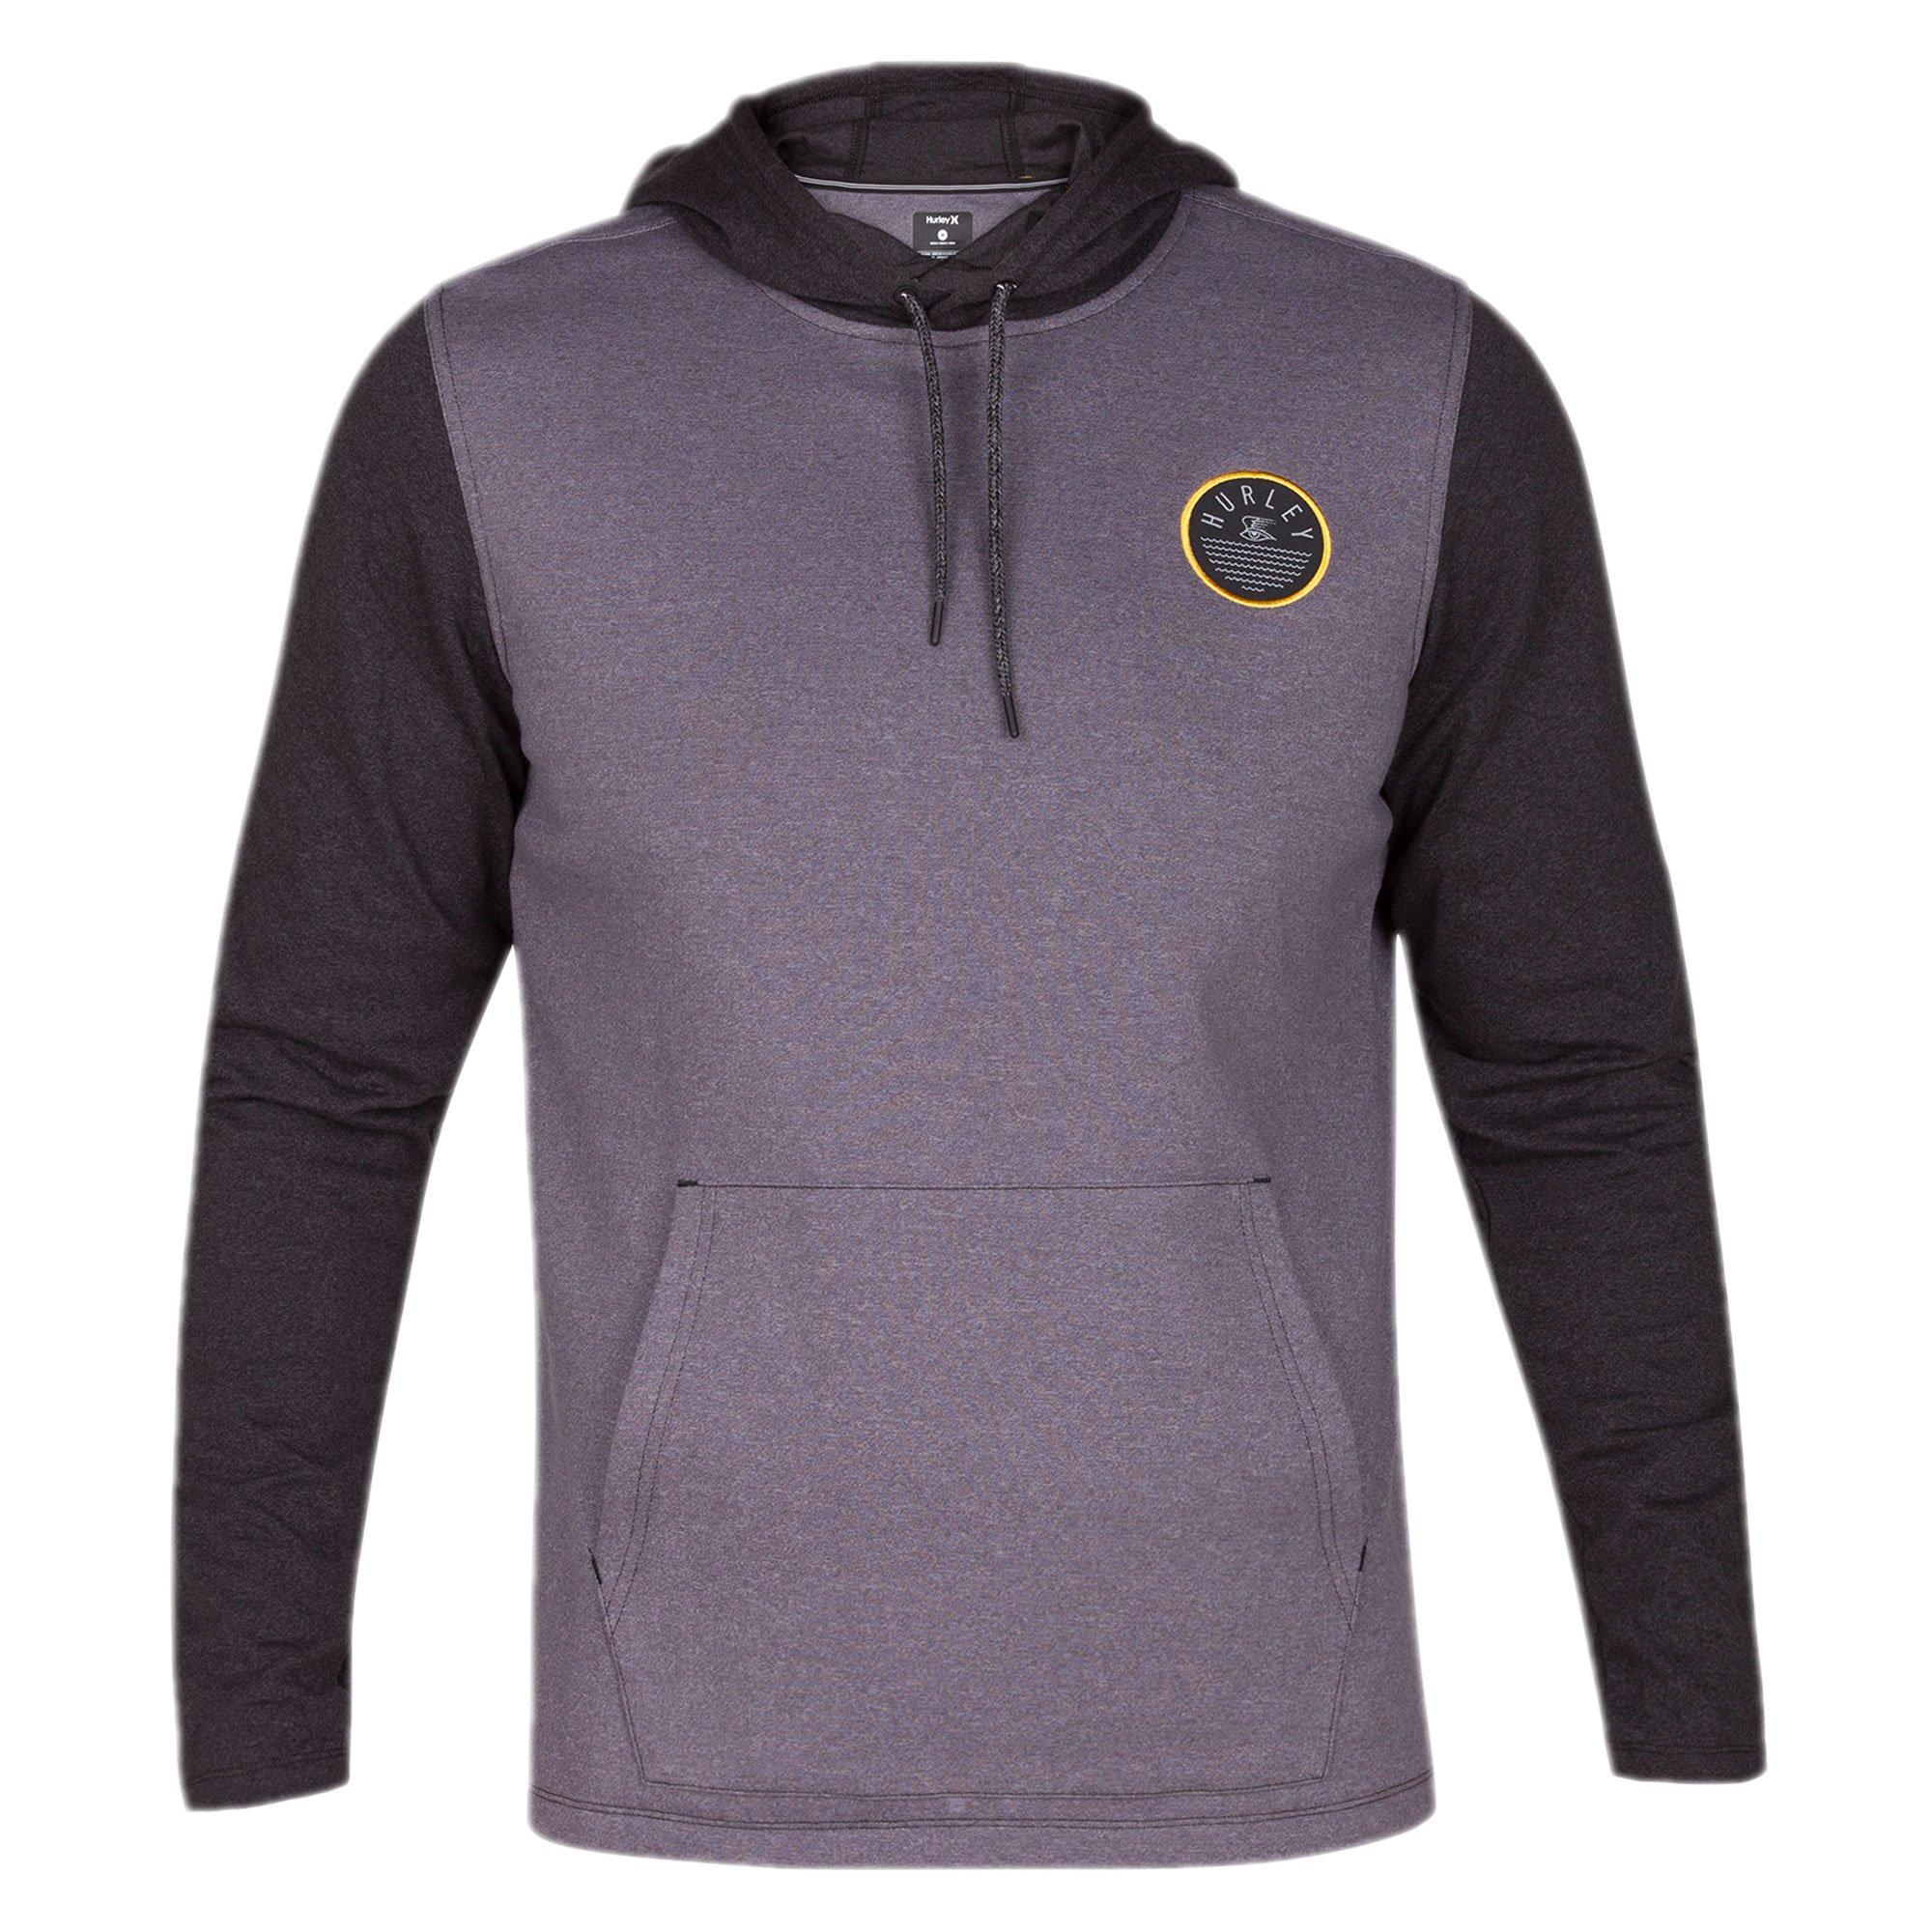 Hurley Men's 999 Hoodie Sweathshirts, Black (00A), Small